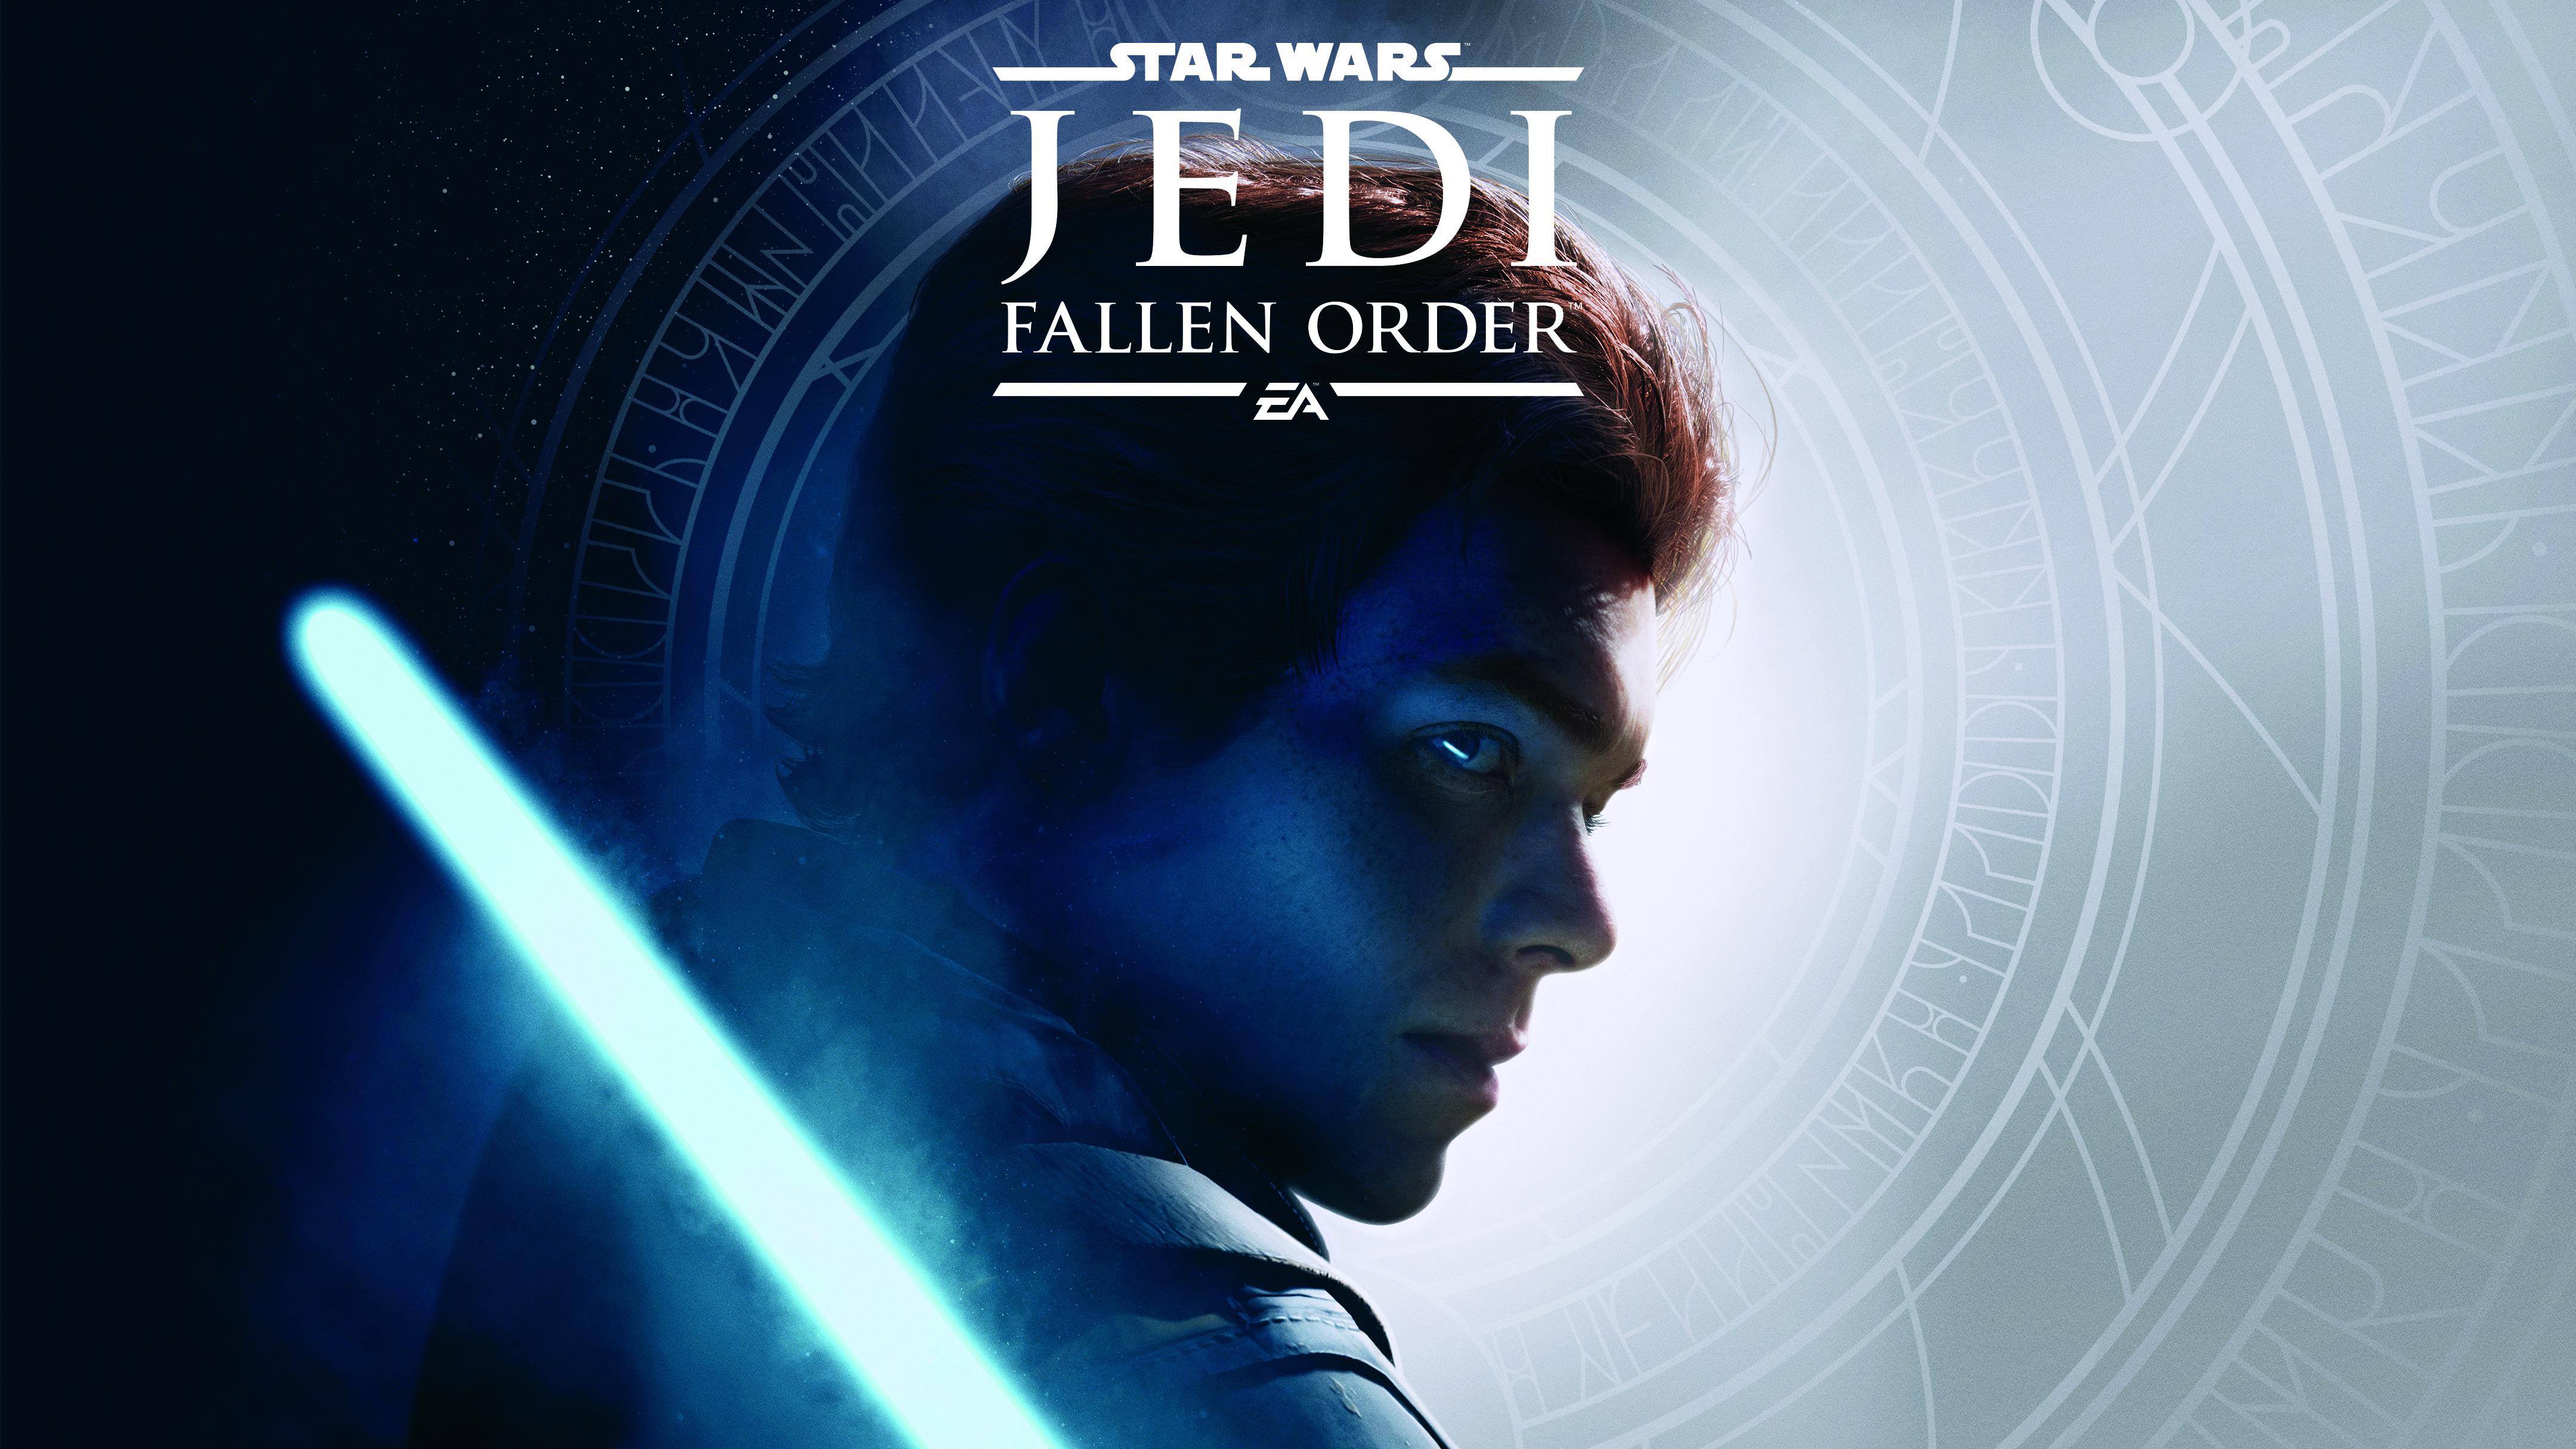 Awesome Star Wars Jedi Fallen Order Iphone Wallpaper